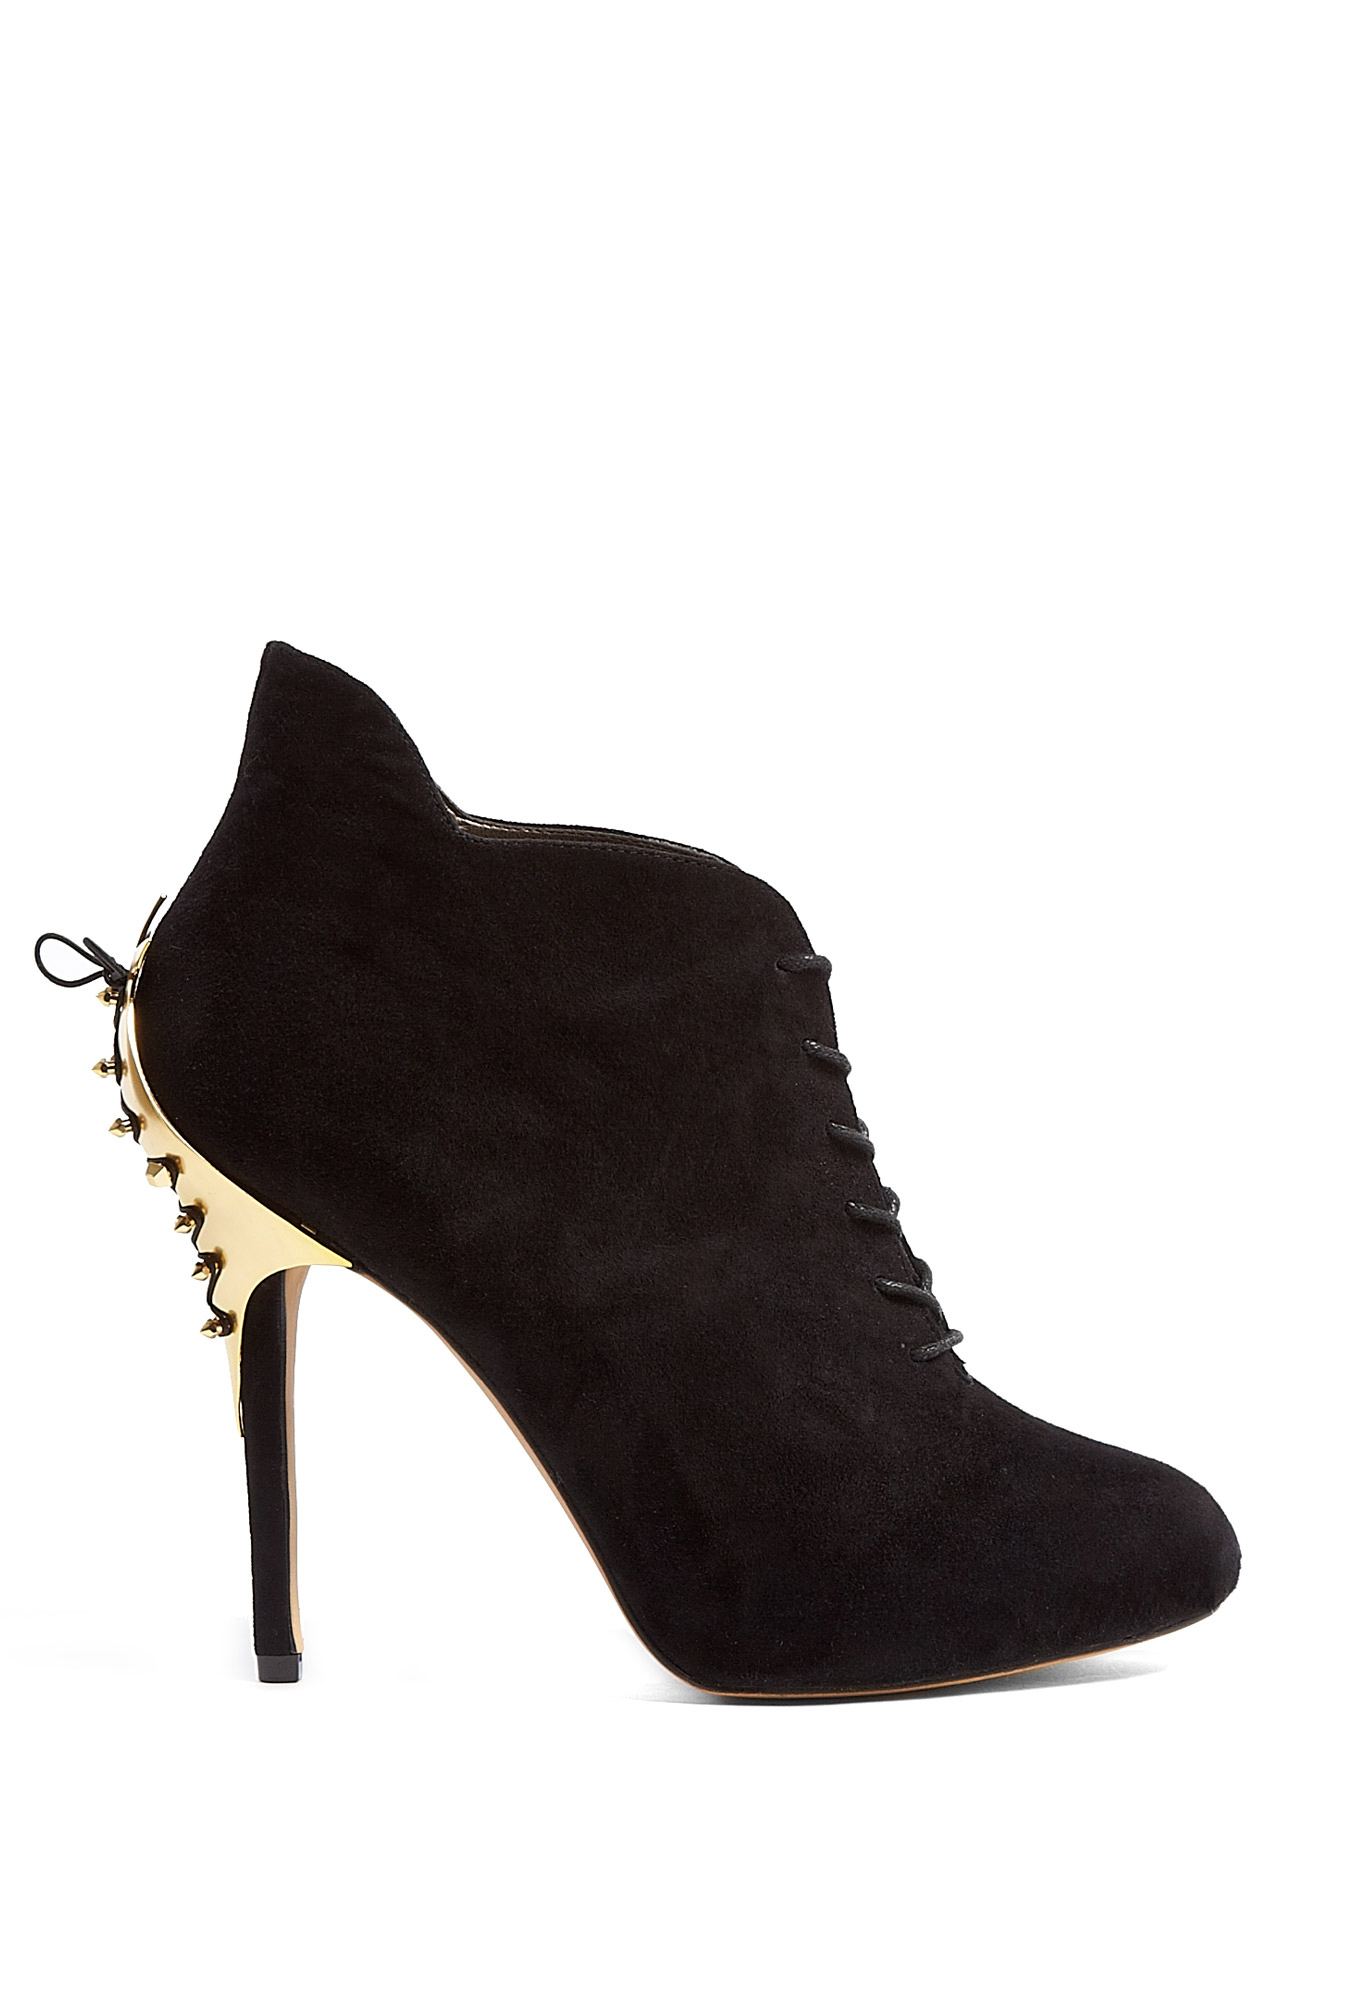 sam edelman black suede lace up elsa ankle boots in black